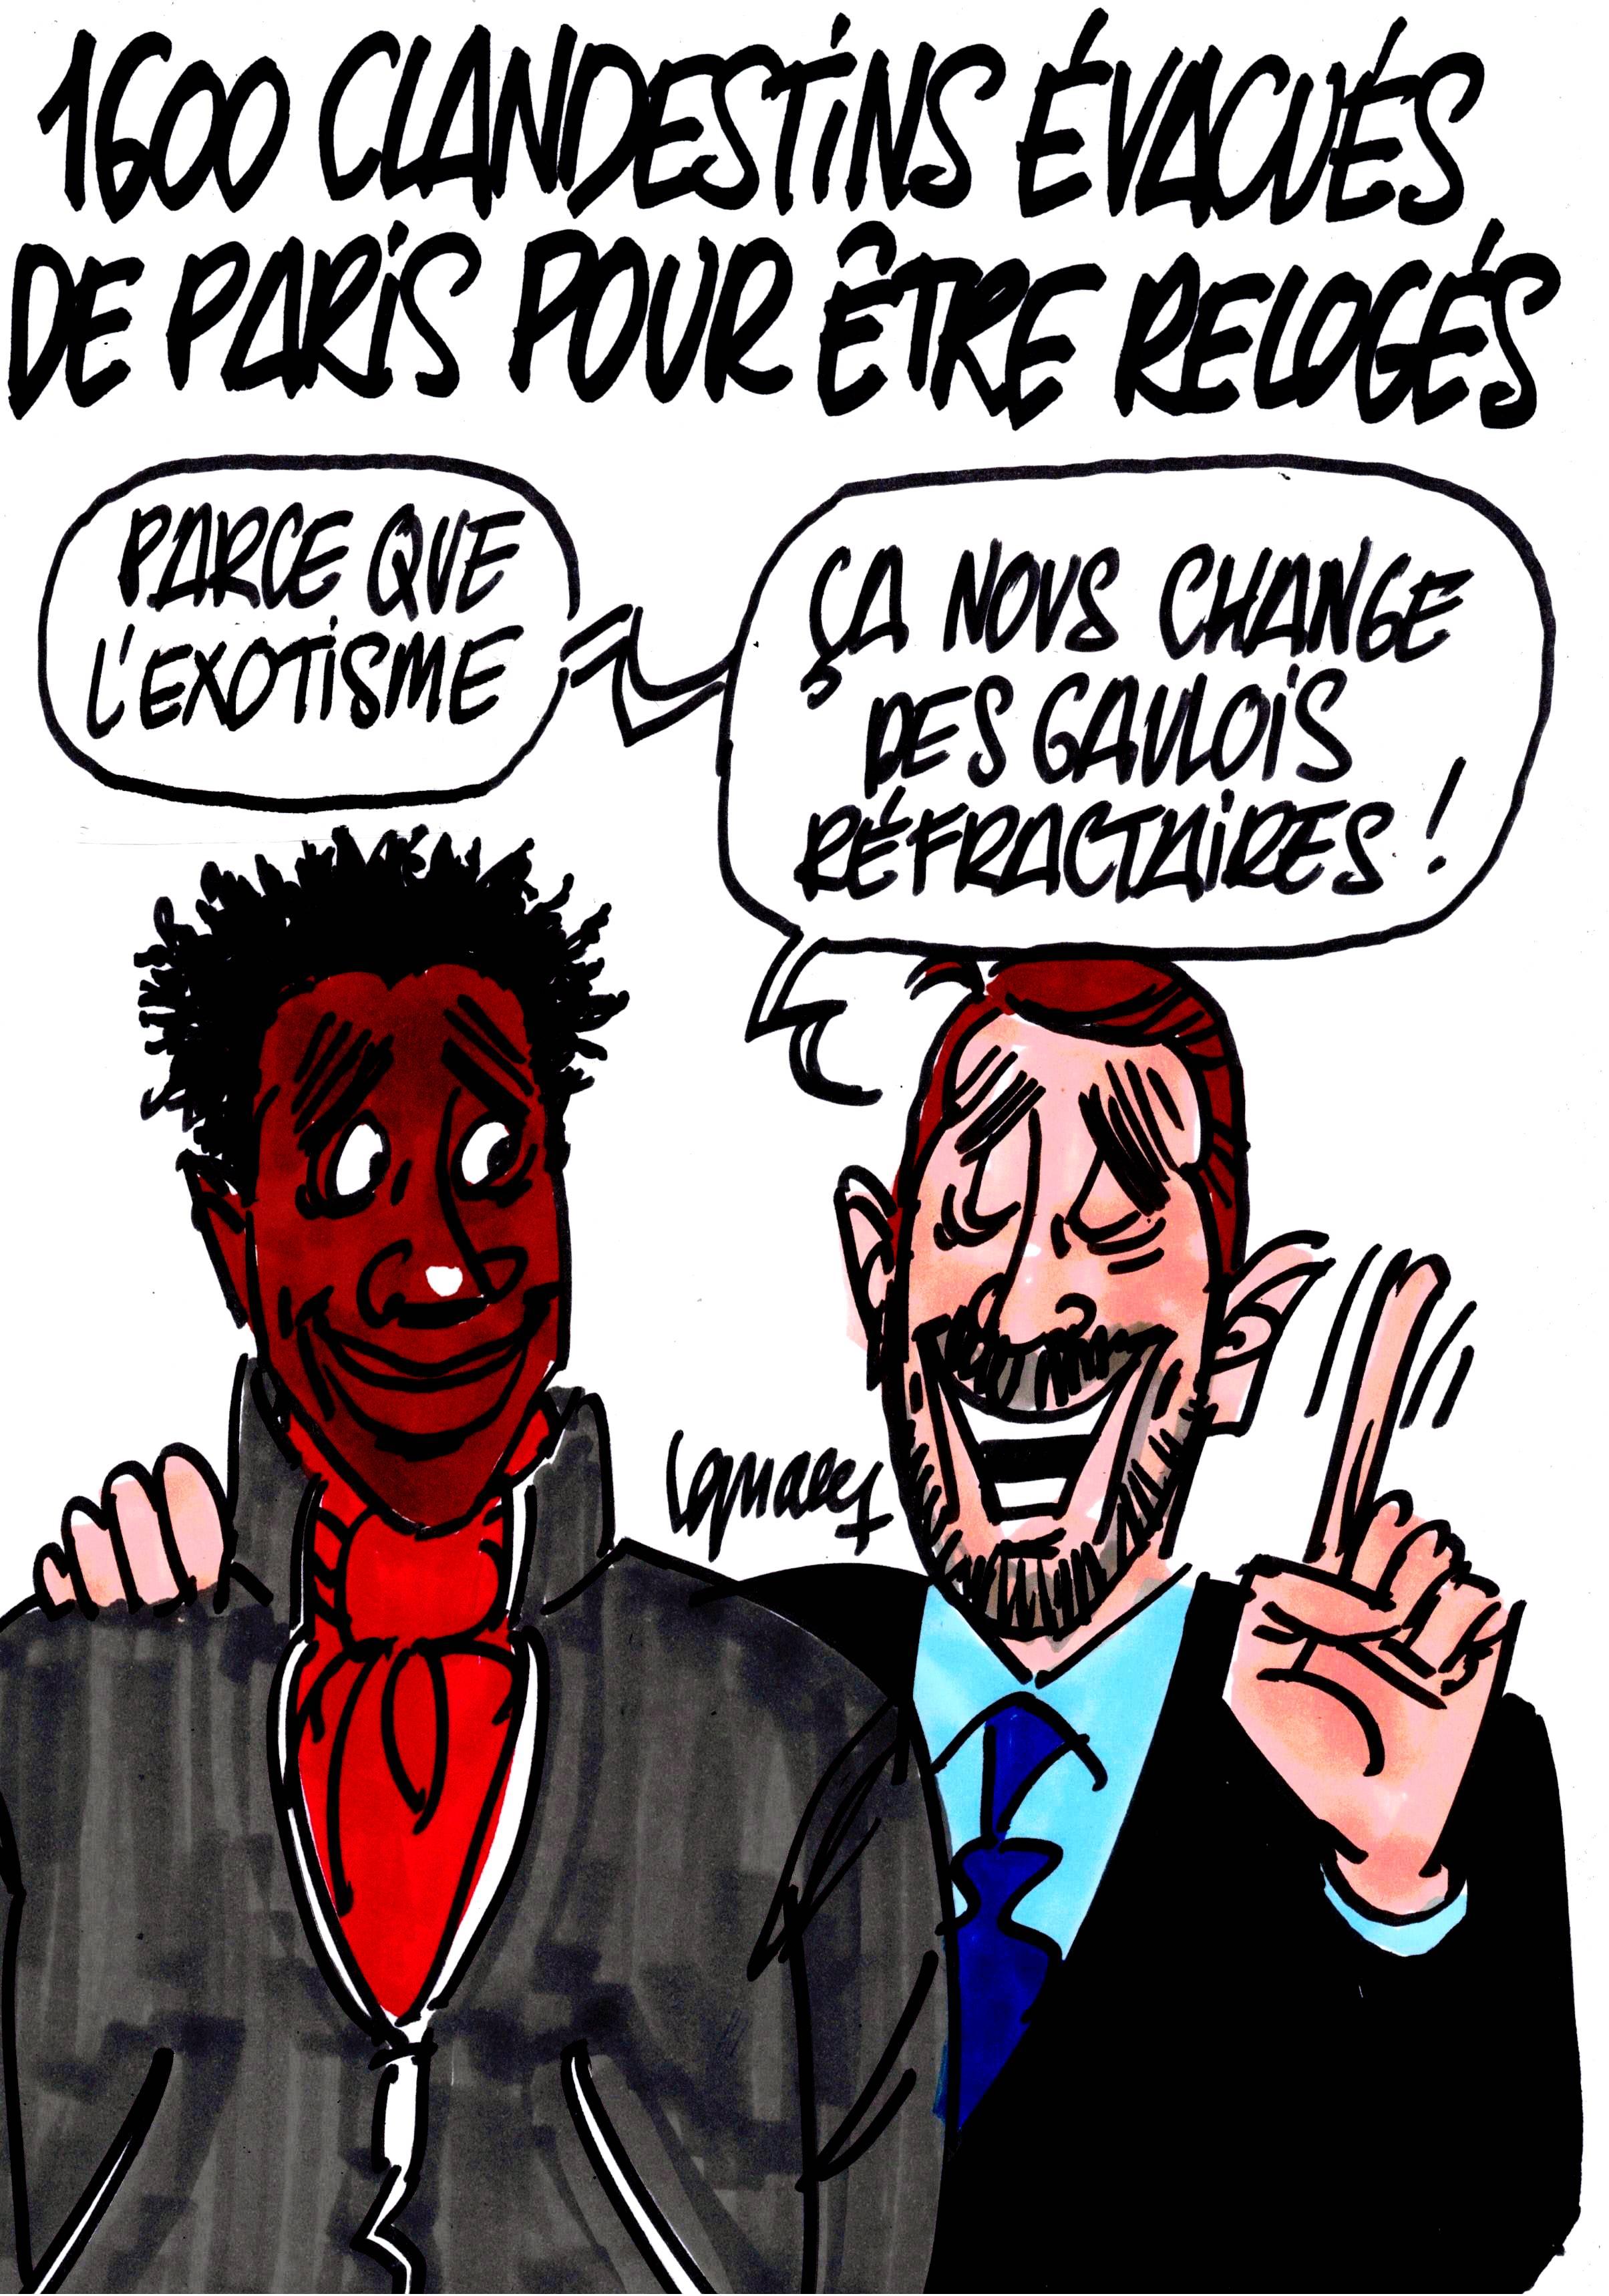 Ignace - 1600 clandestins évacués de Paris